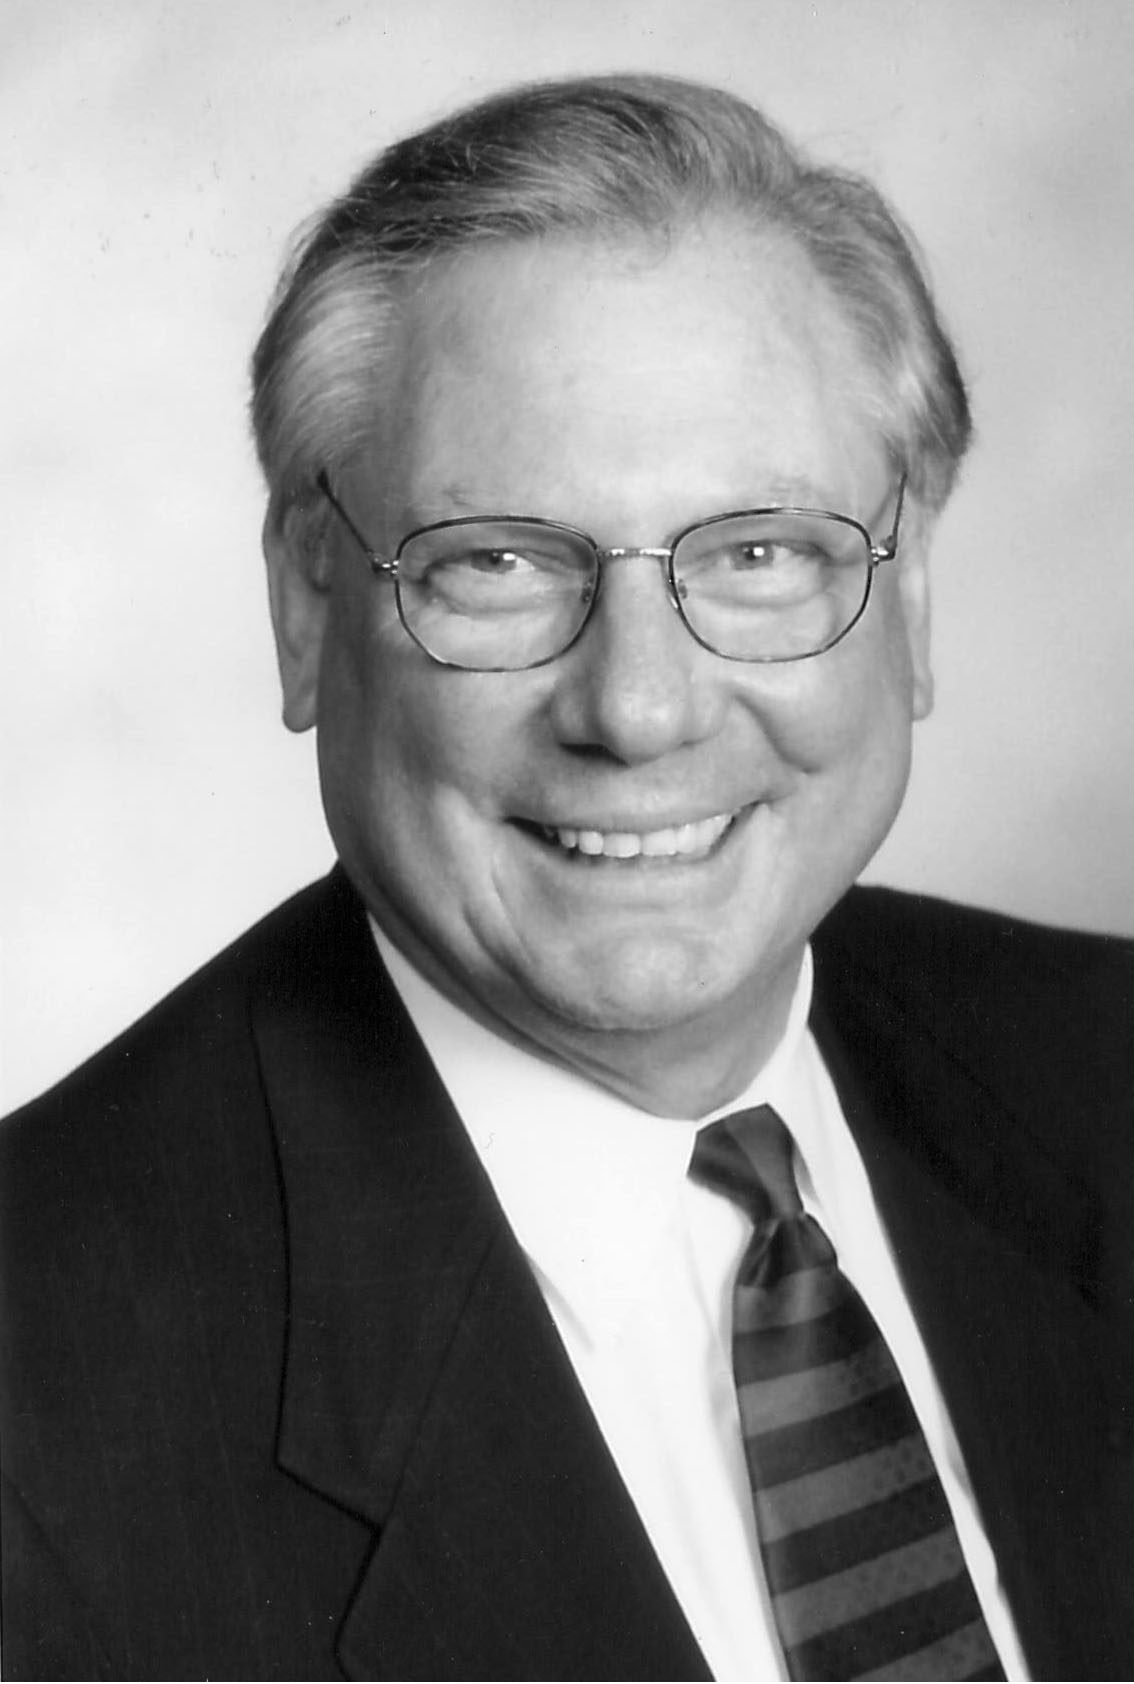 Dr. Robert Rose, 1997-2001